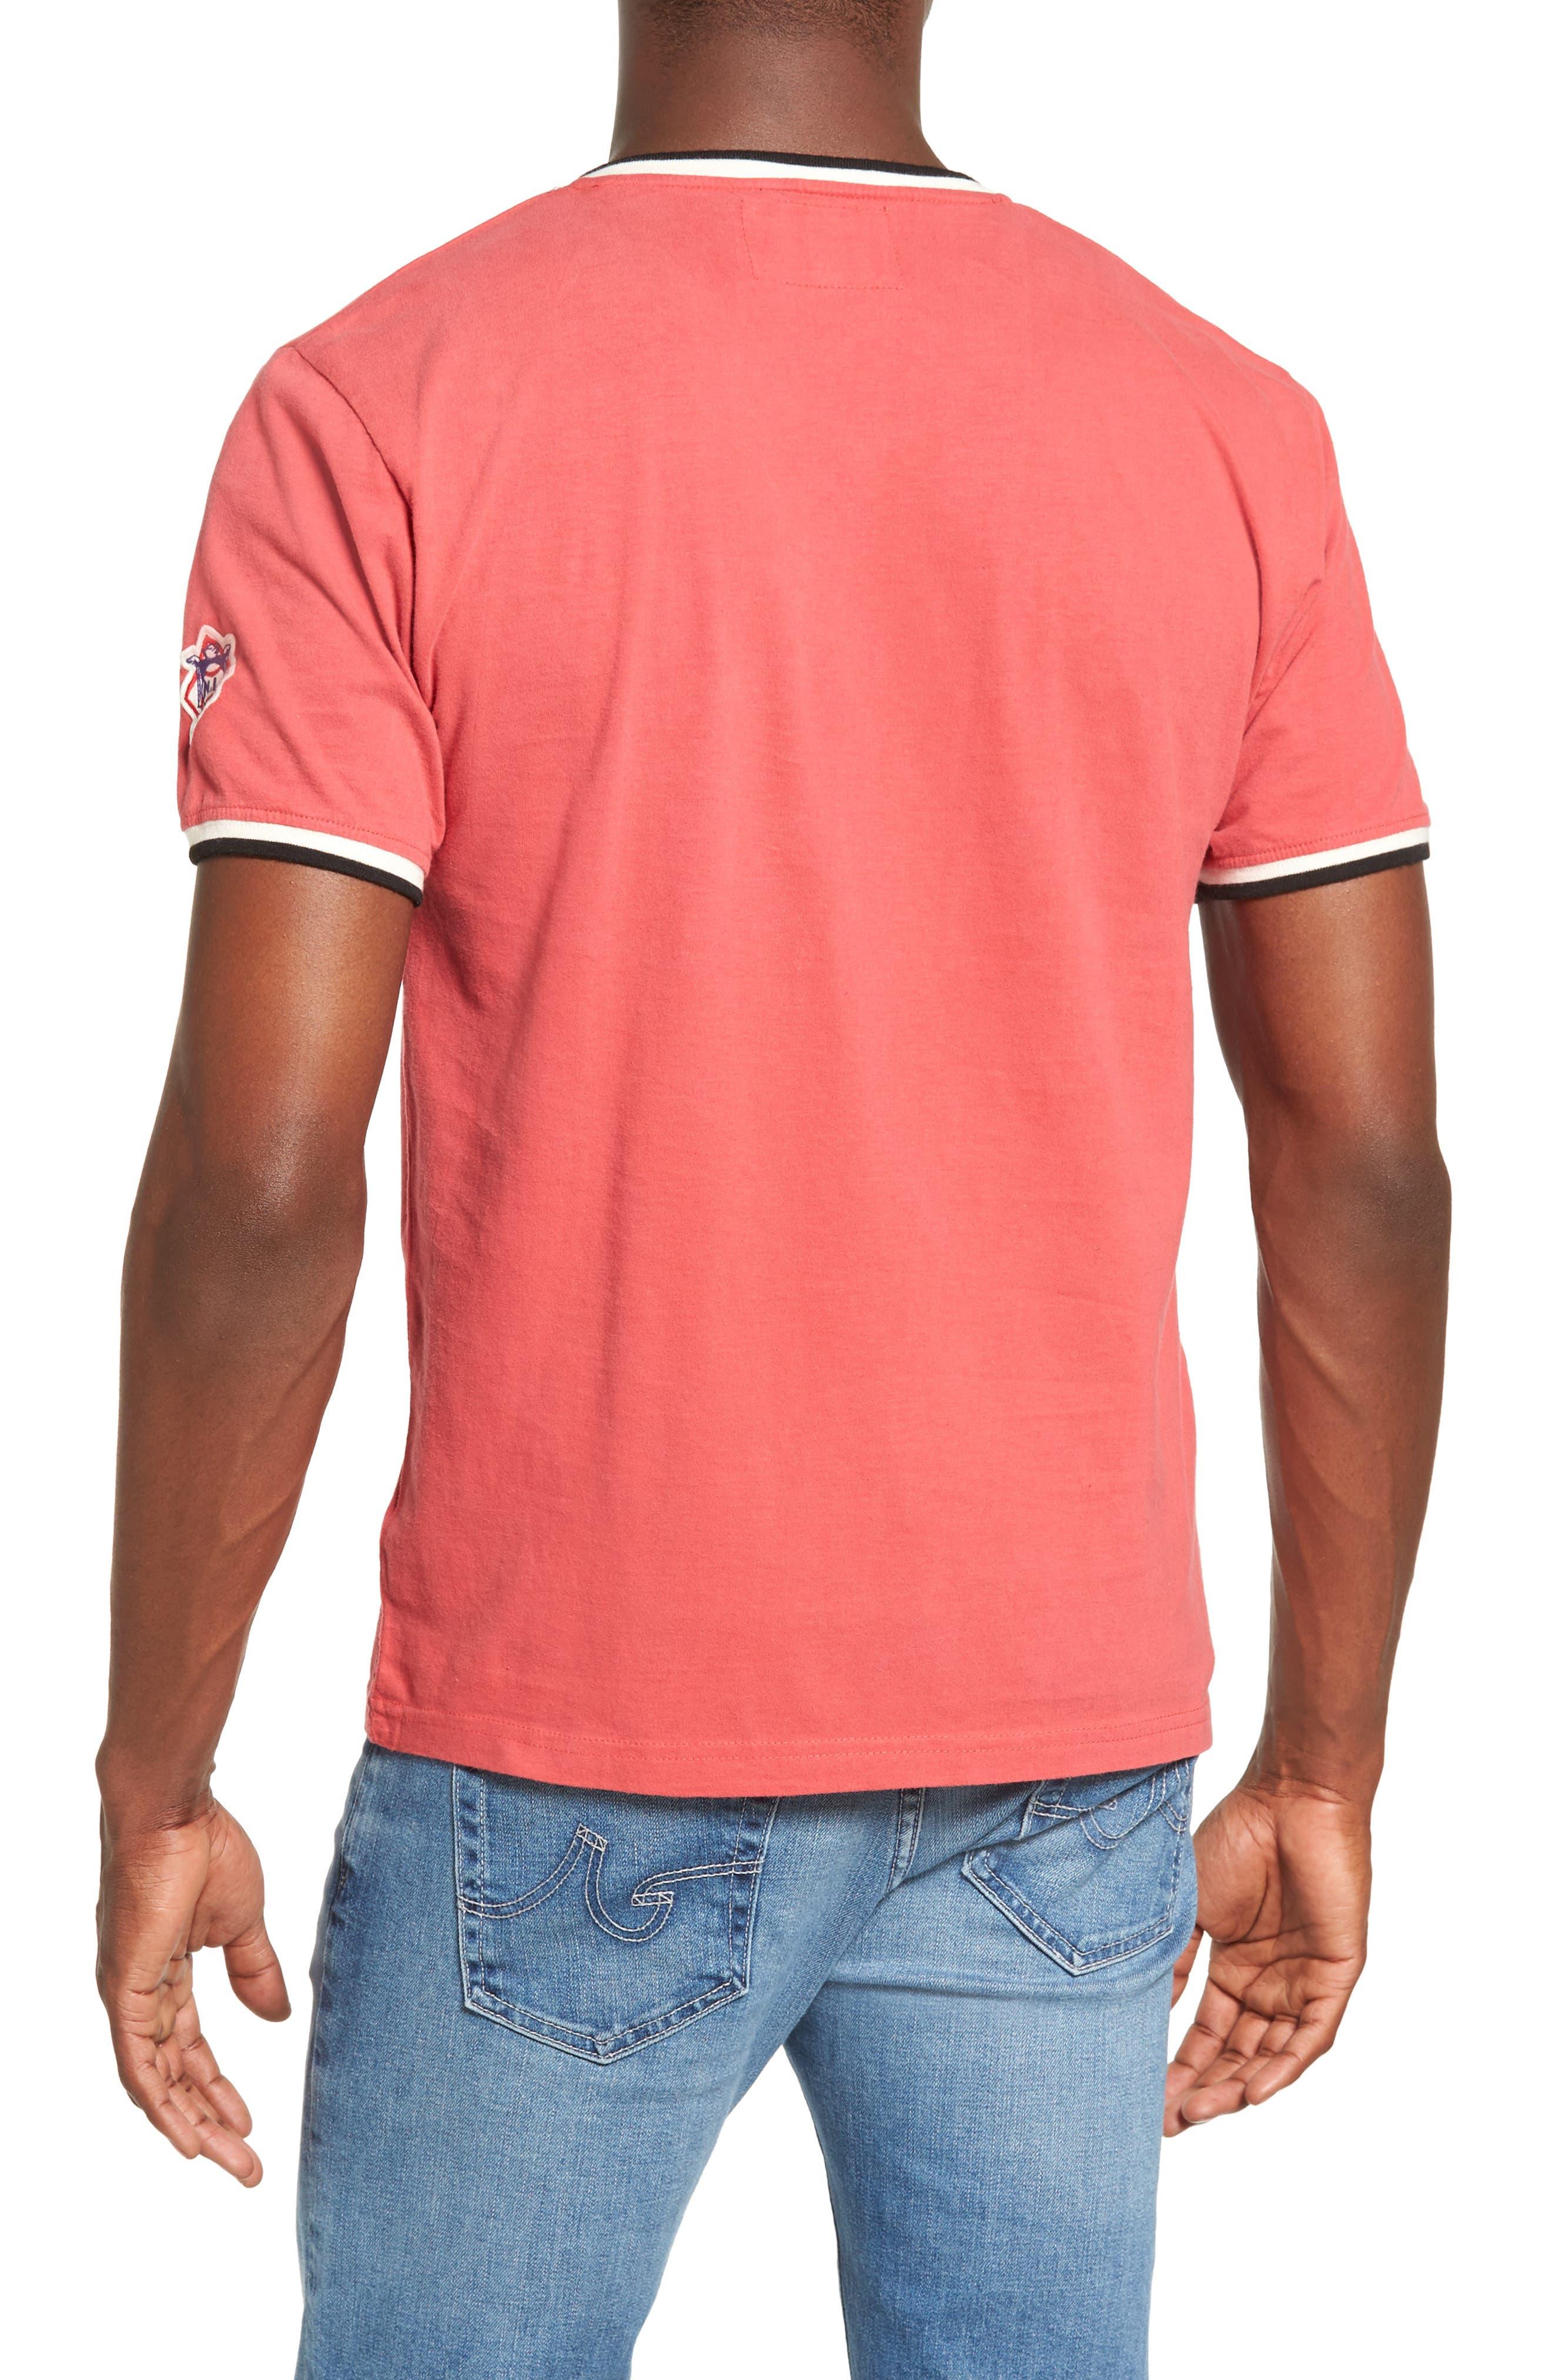 Eastwood Cincinnati Reds T-Shirt,                             Alternate thumbnail 2, color,